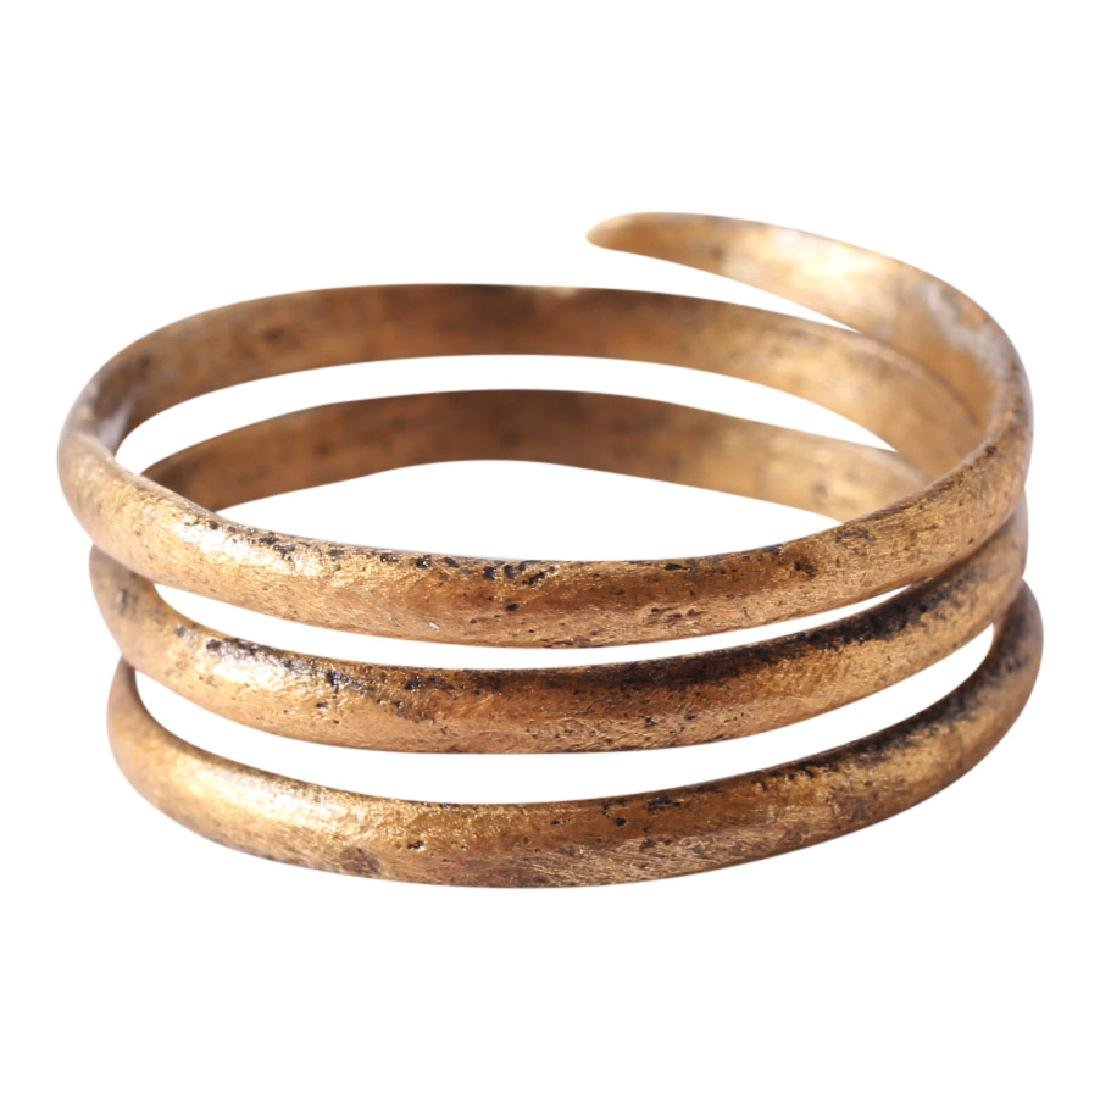 Viking Warrior's Coil Ring, 10th Century